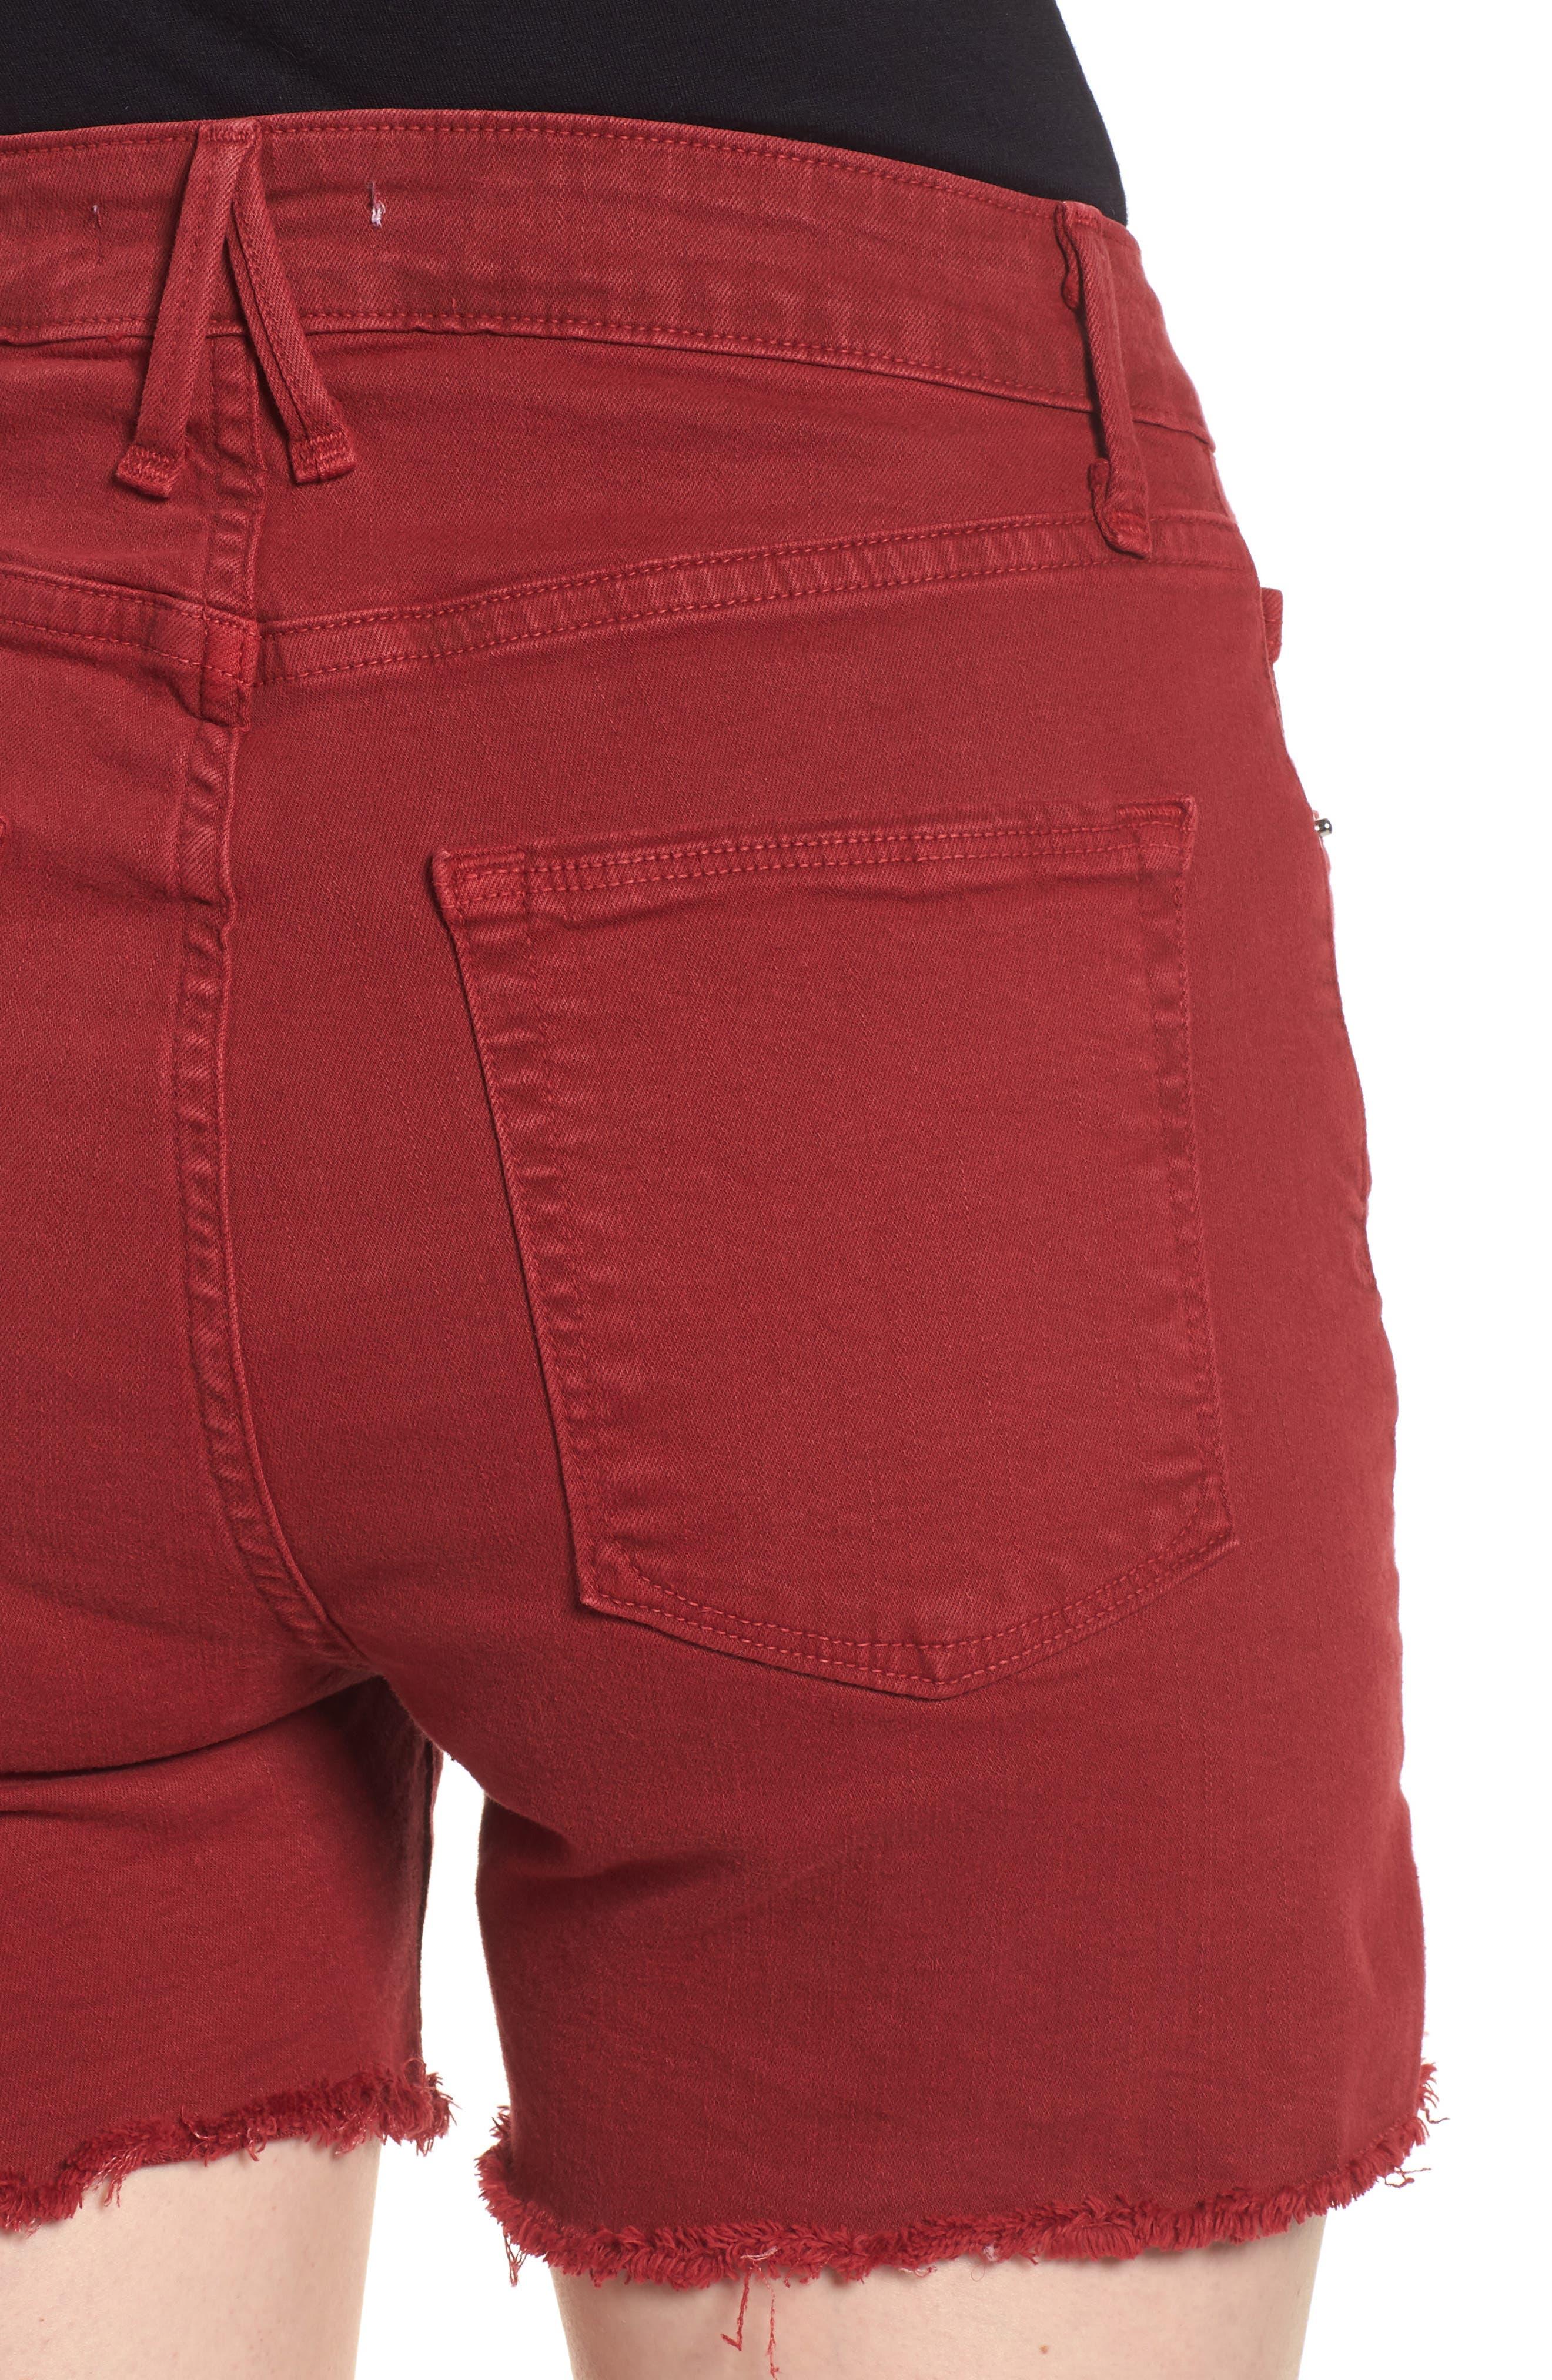 High Waist Cutoff Shorts,                             Alternate thumbnail 6, color,                             Red